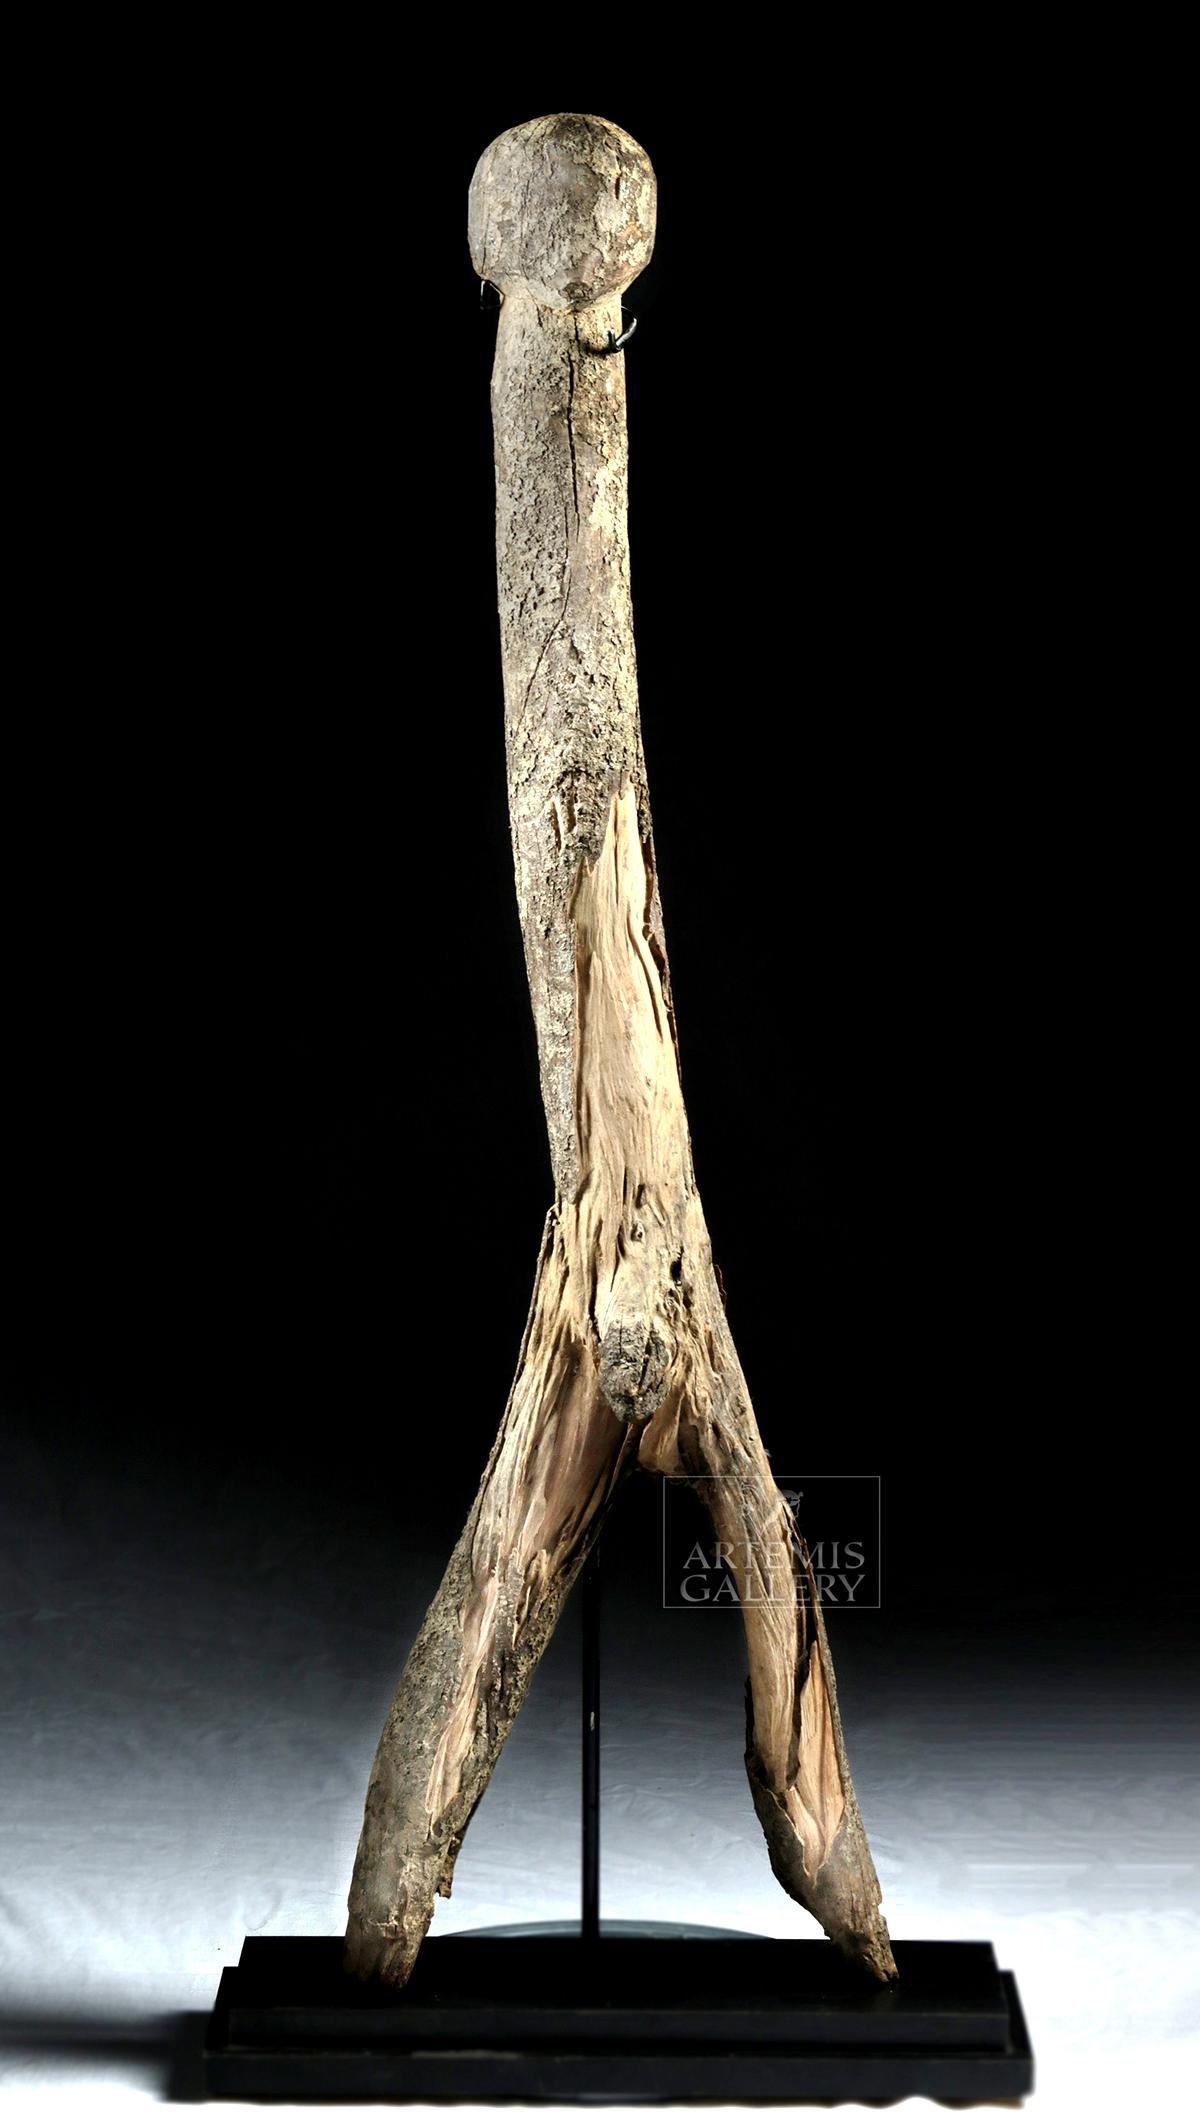 Early 20th C. African Burkina Faso Wood Figure, Phallic